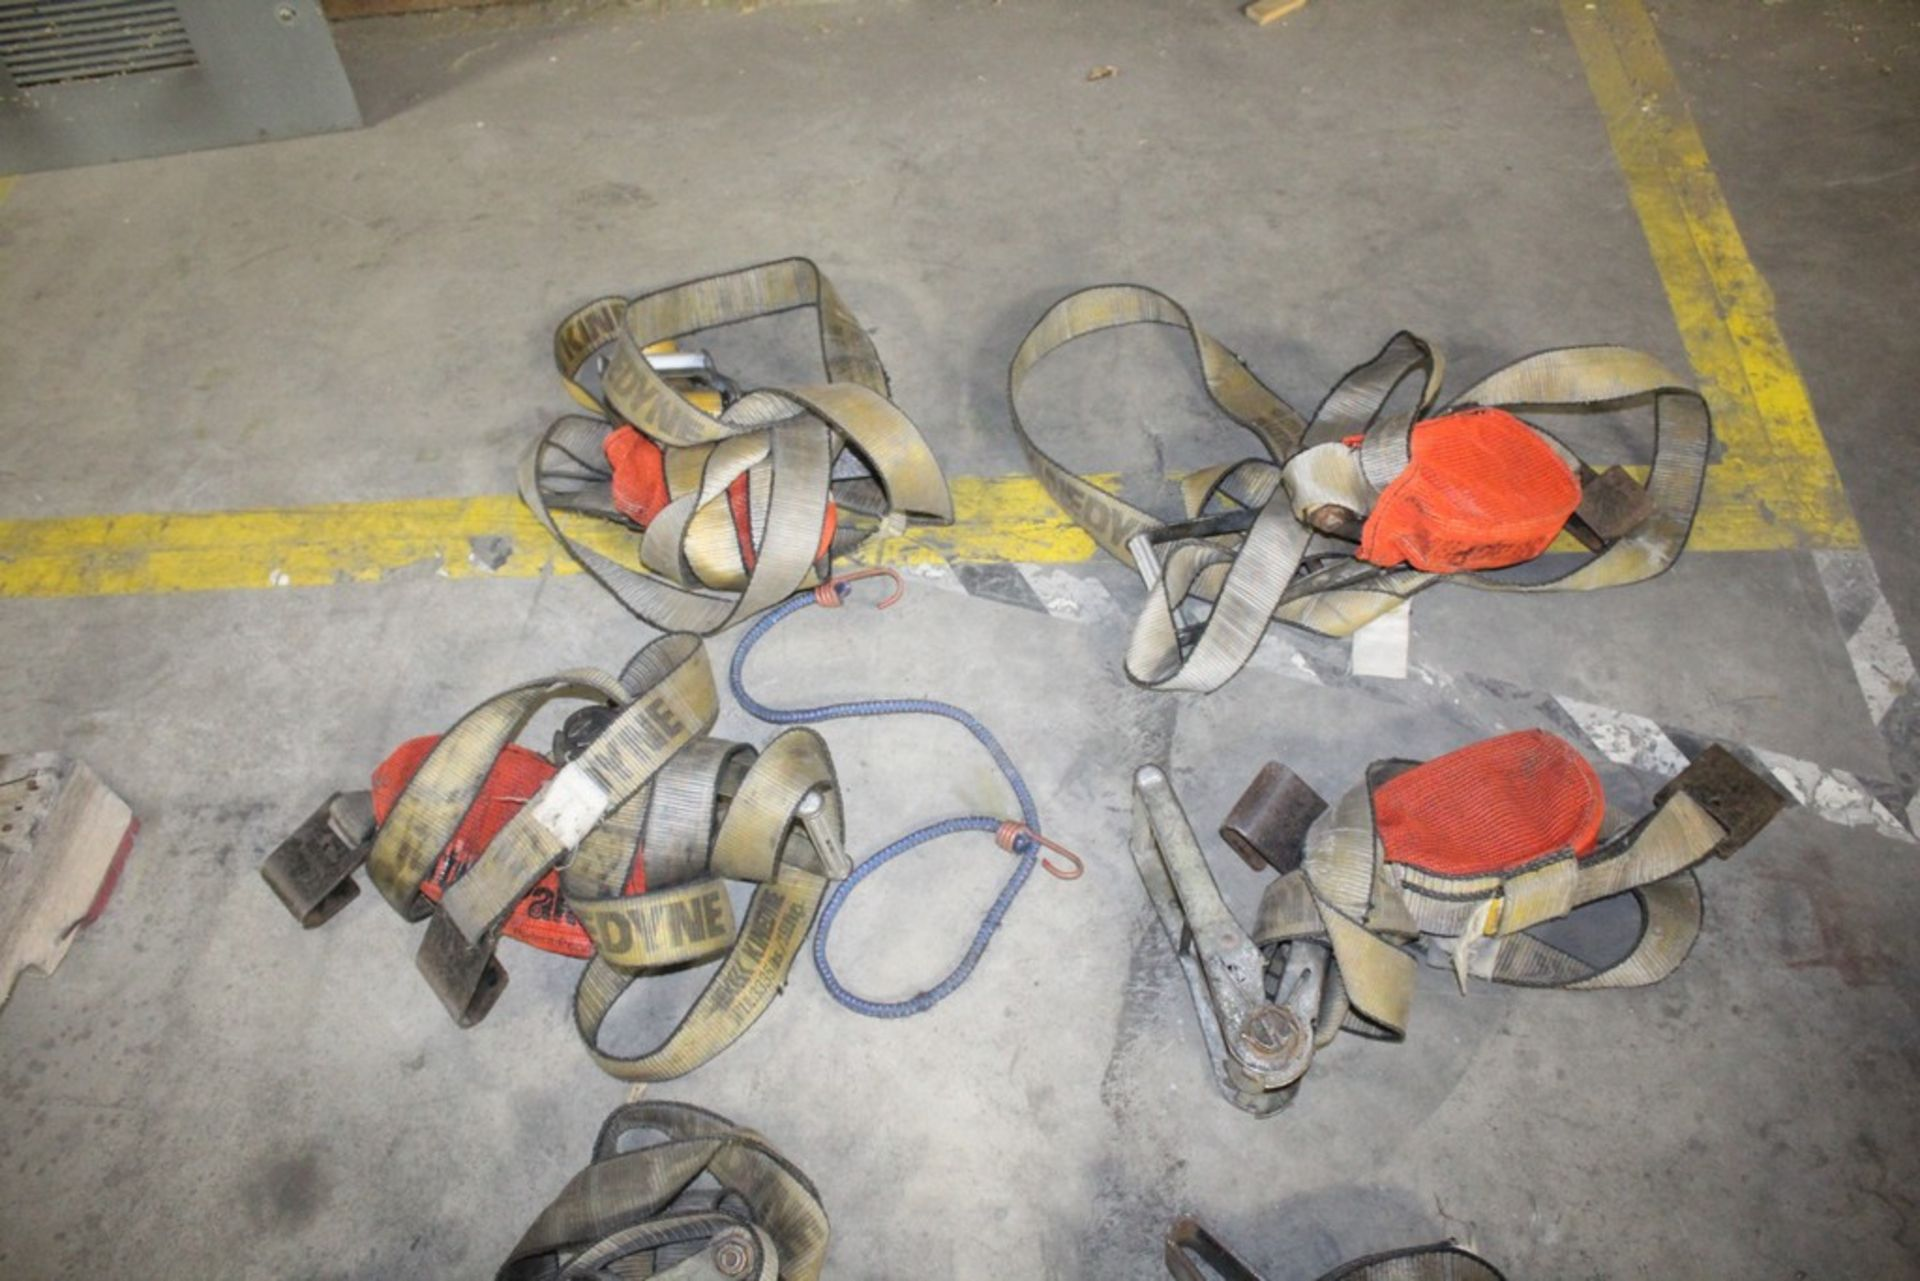 Rachet & Tie Down Straps - (8) Total Complete Pieces - Image 3 of 4